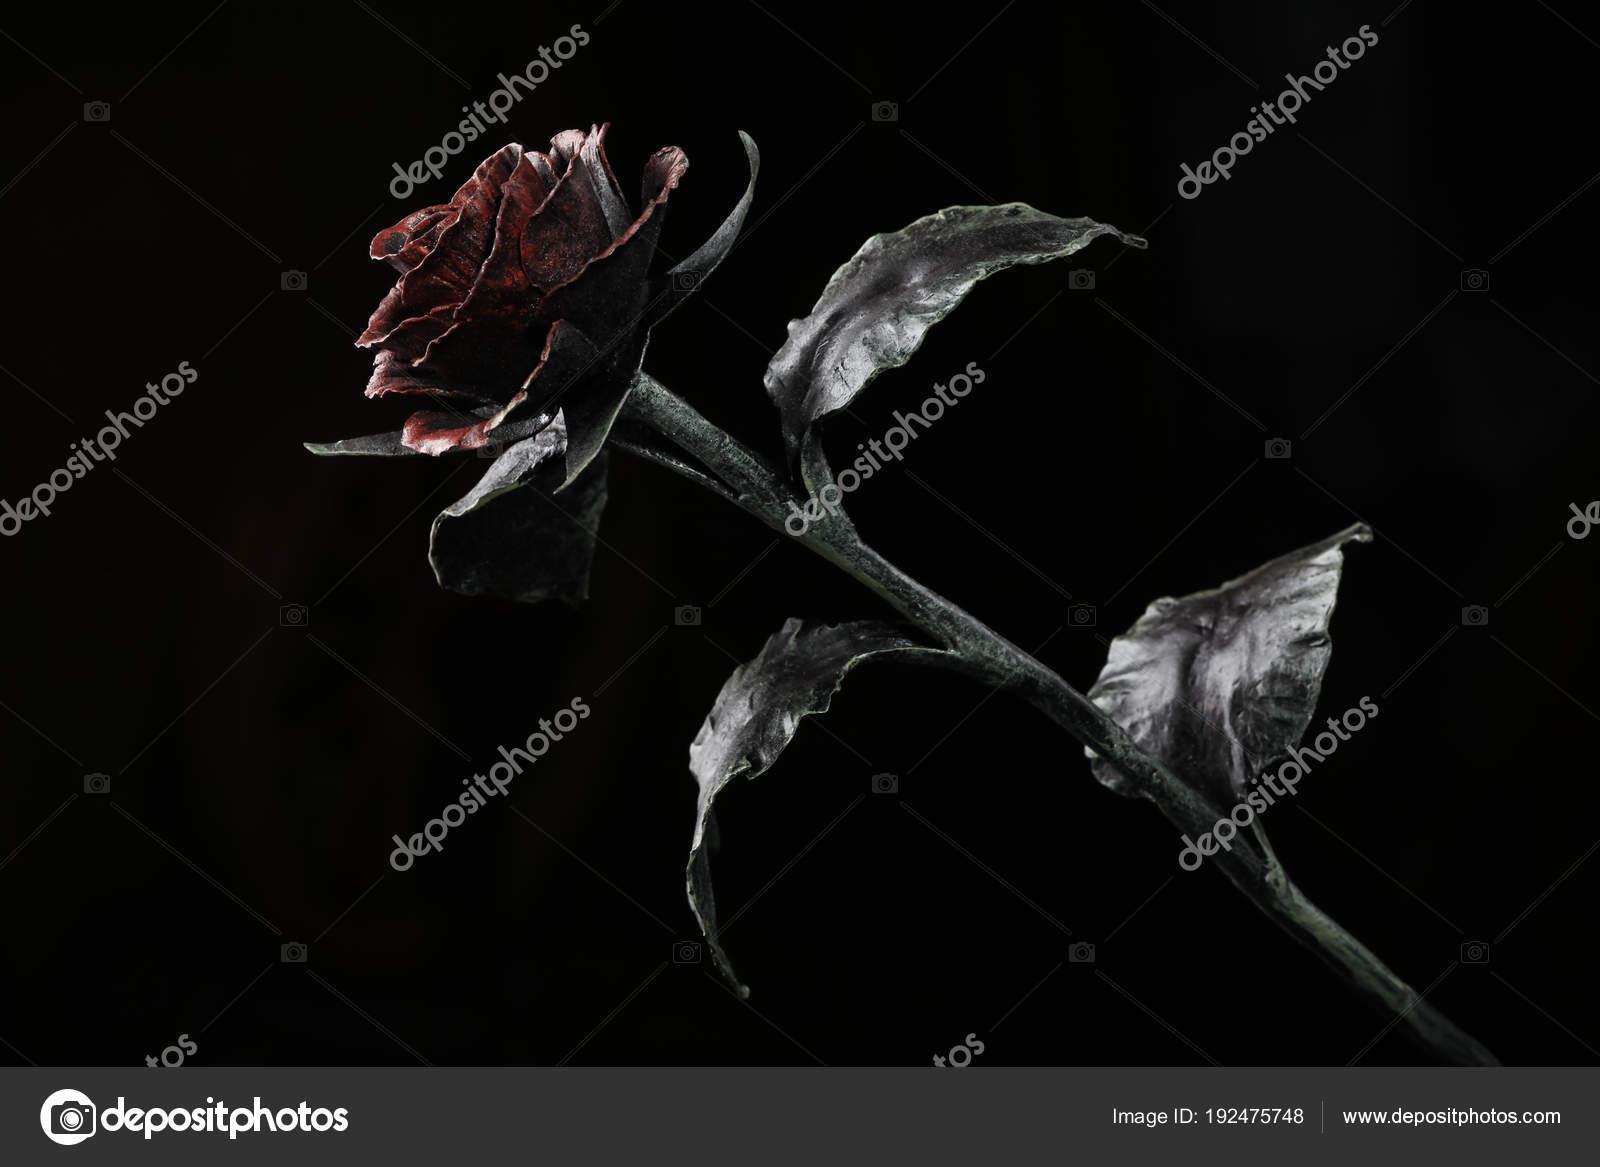 The Rose In Light On The Dark Background Stock Photo C Dymov D 192475748